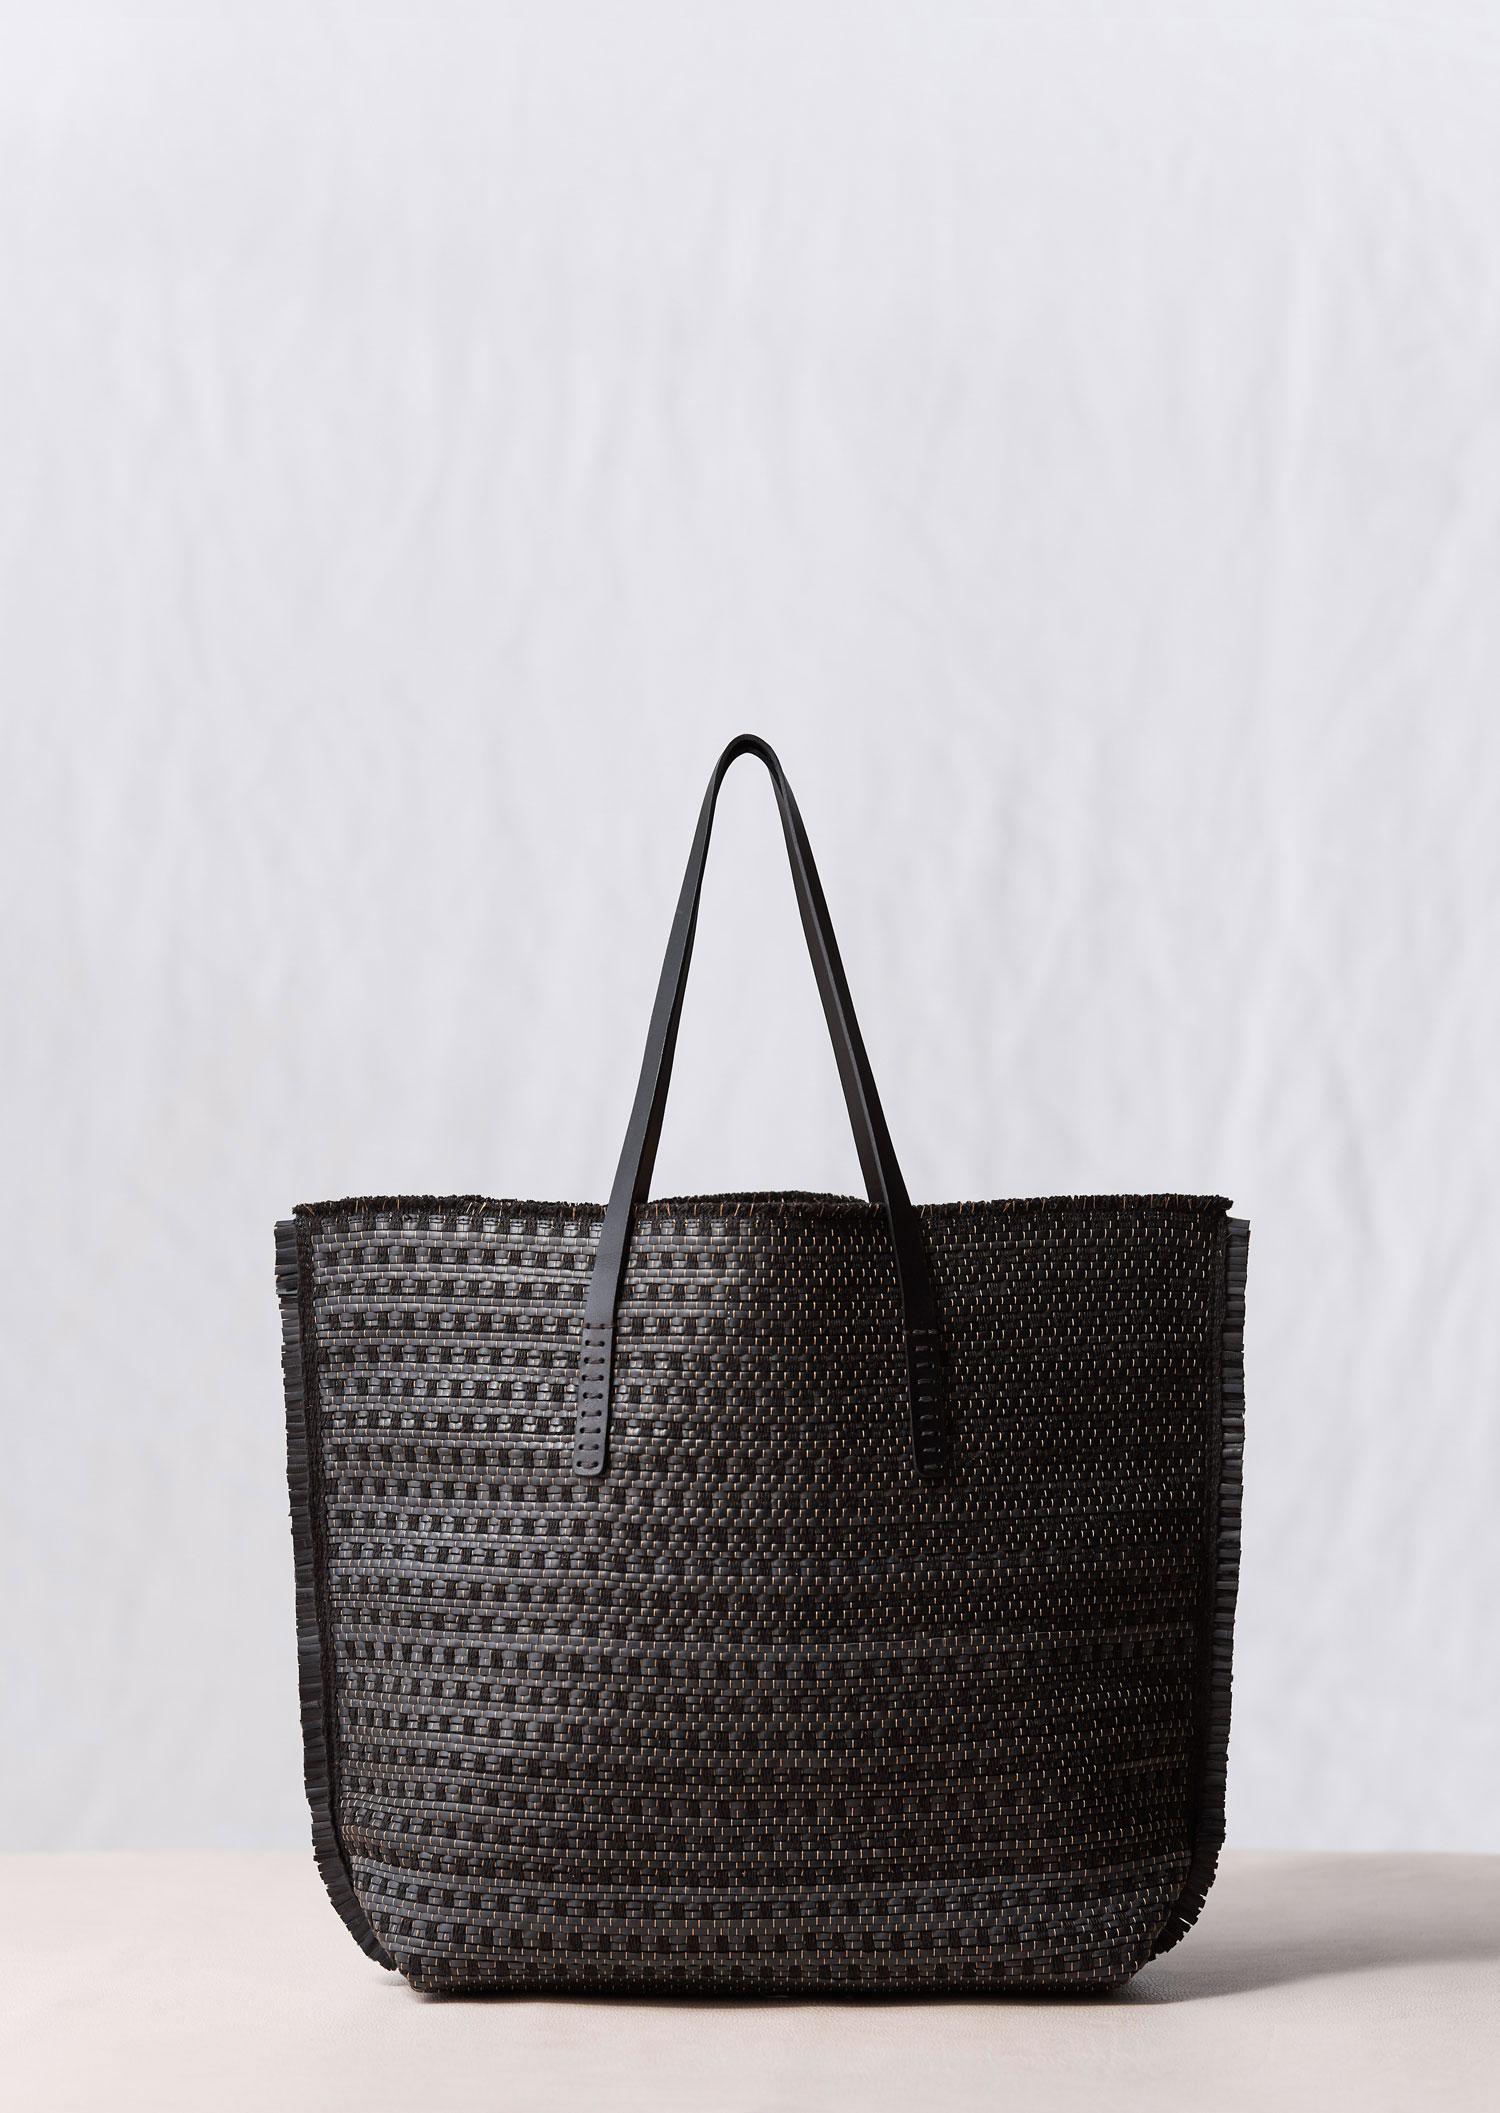 Basket-weave-BL-R-R_web.jpg